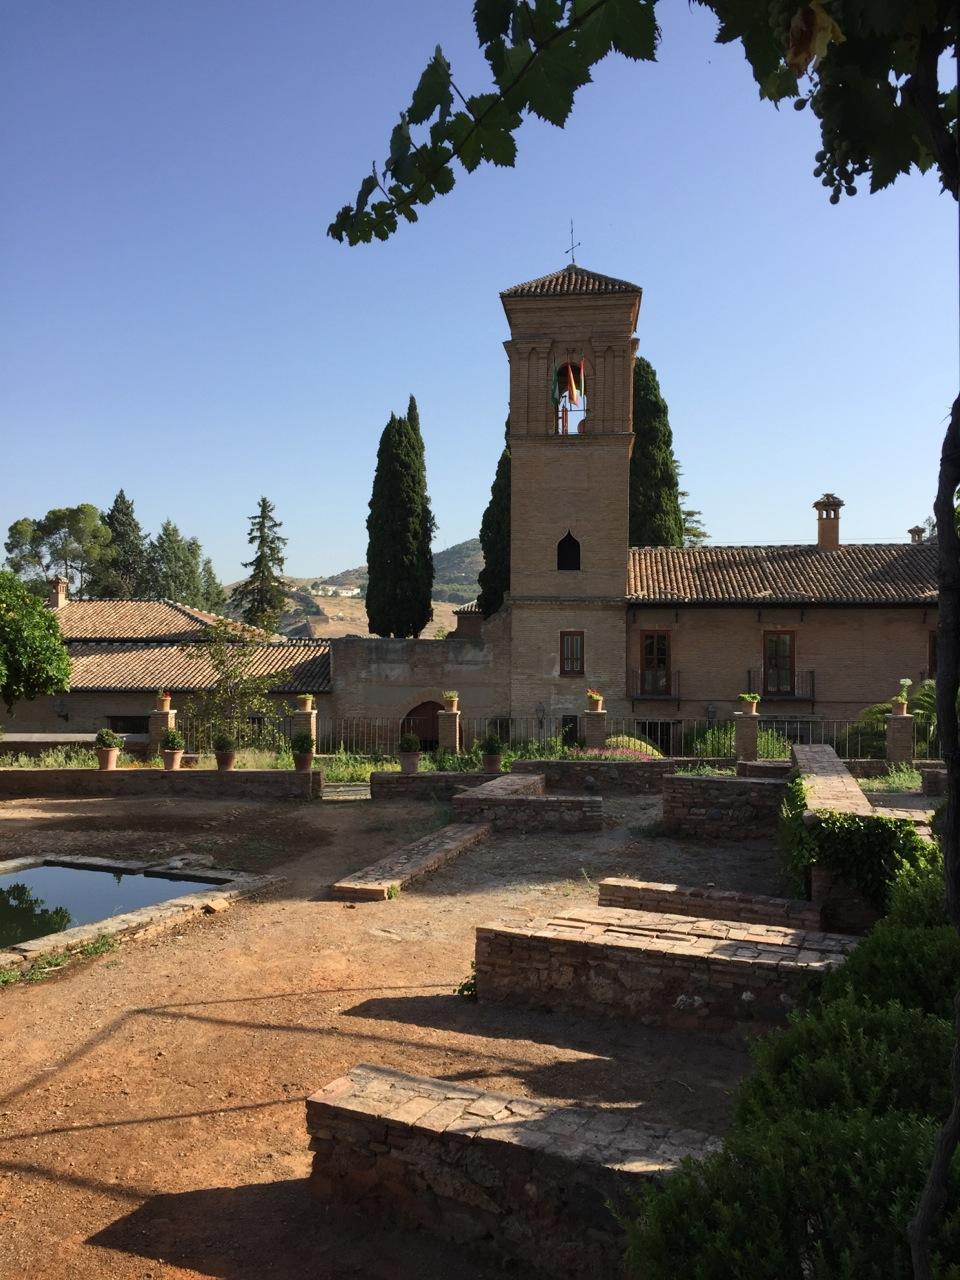 Generaliffe gardens, Alhambra, Granada